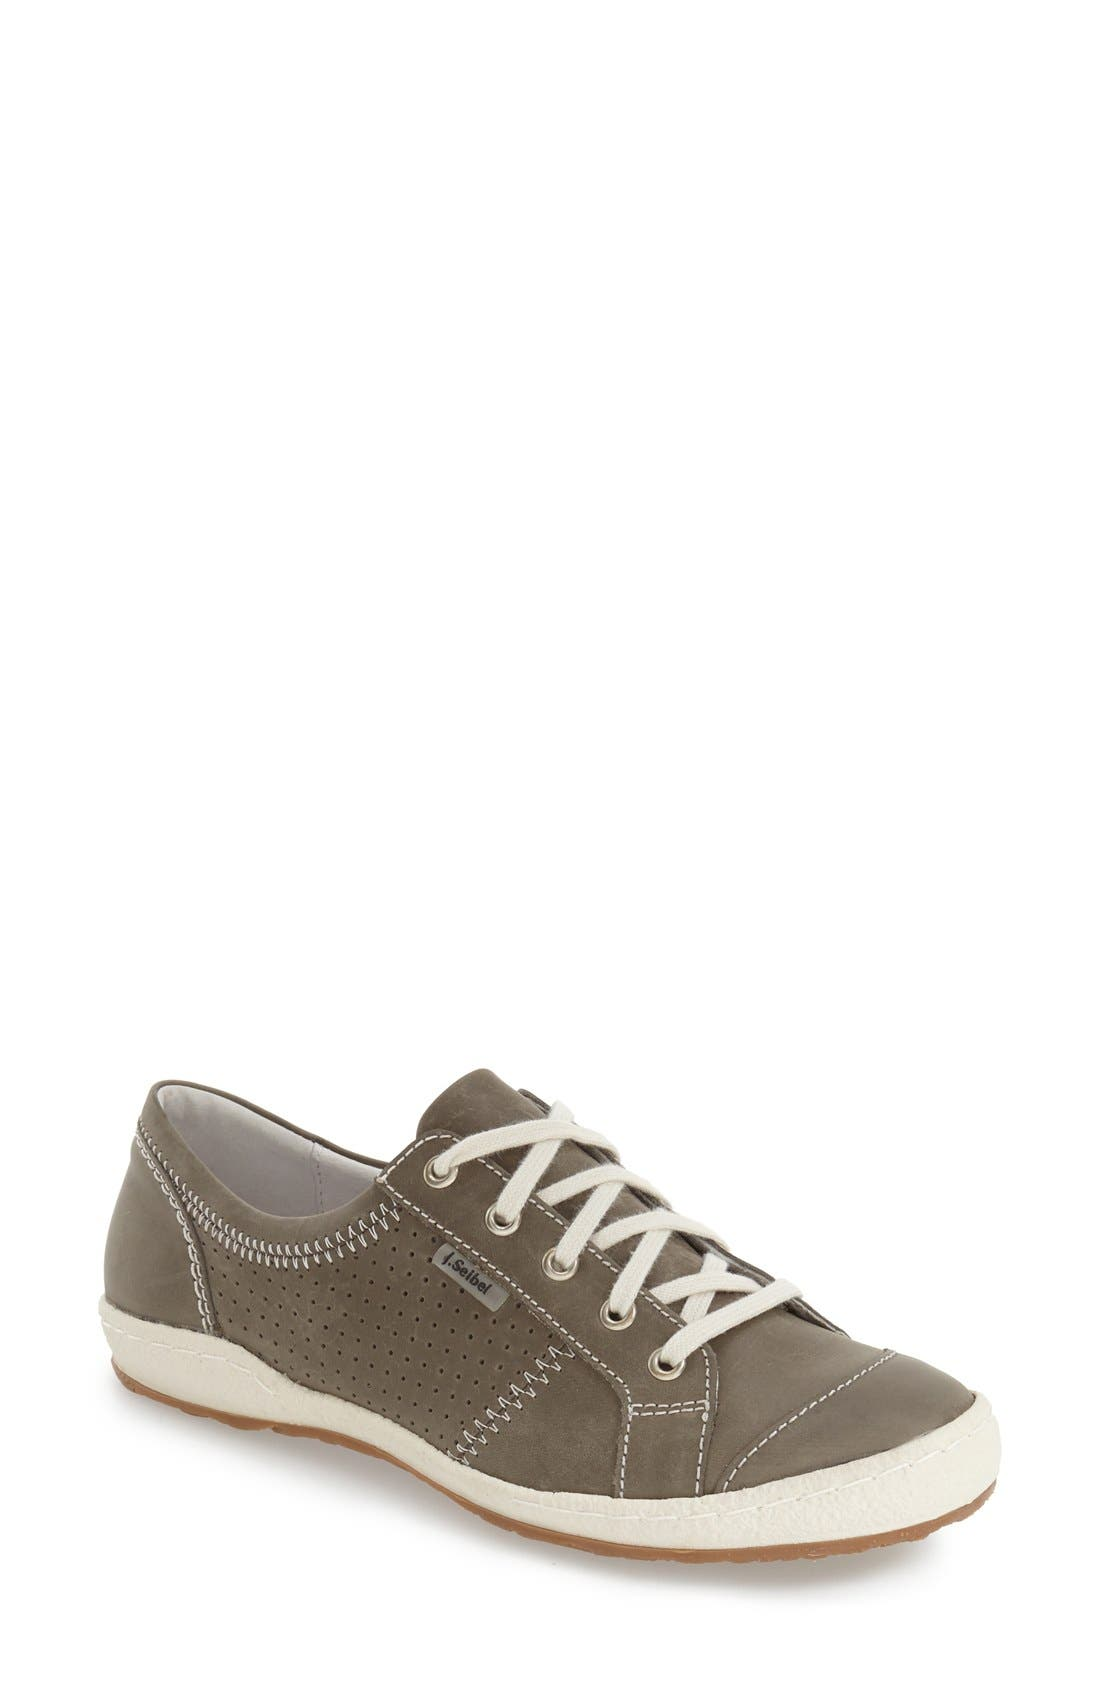 'Caspian' Sneaker,                             Main thumbnail 1, color,                             Grigio Leather